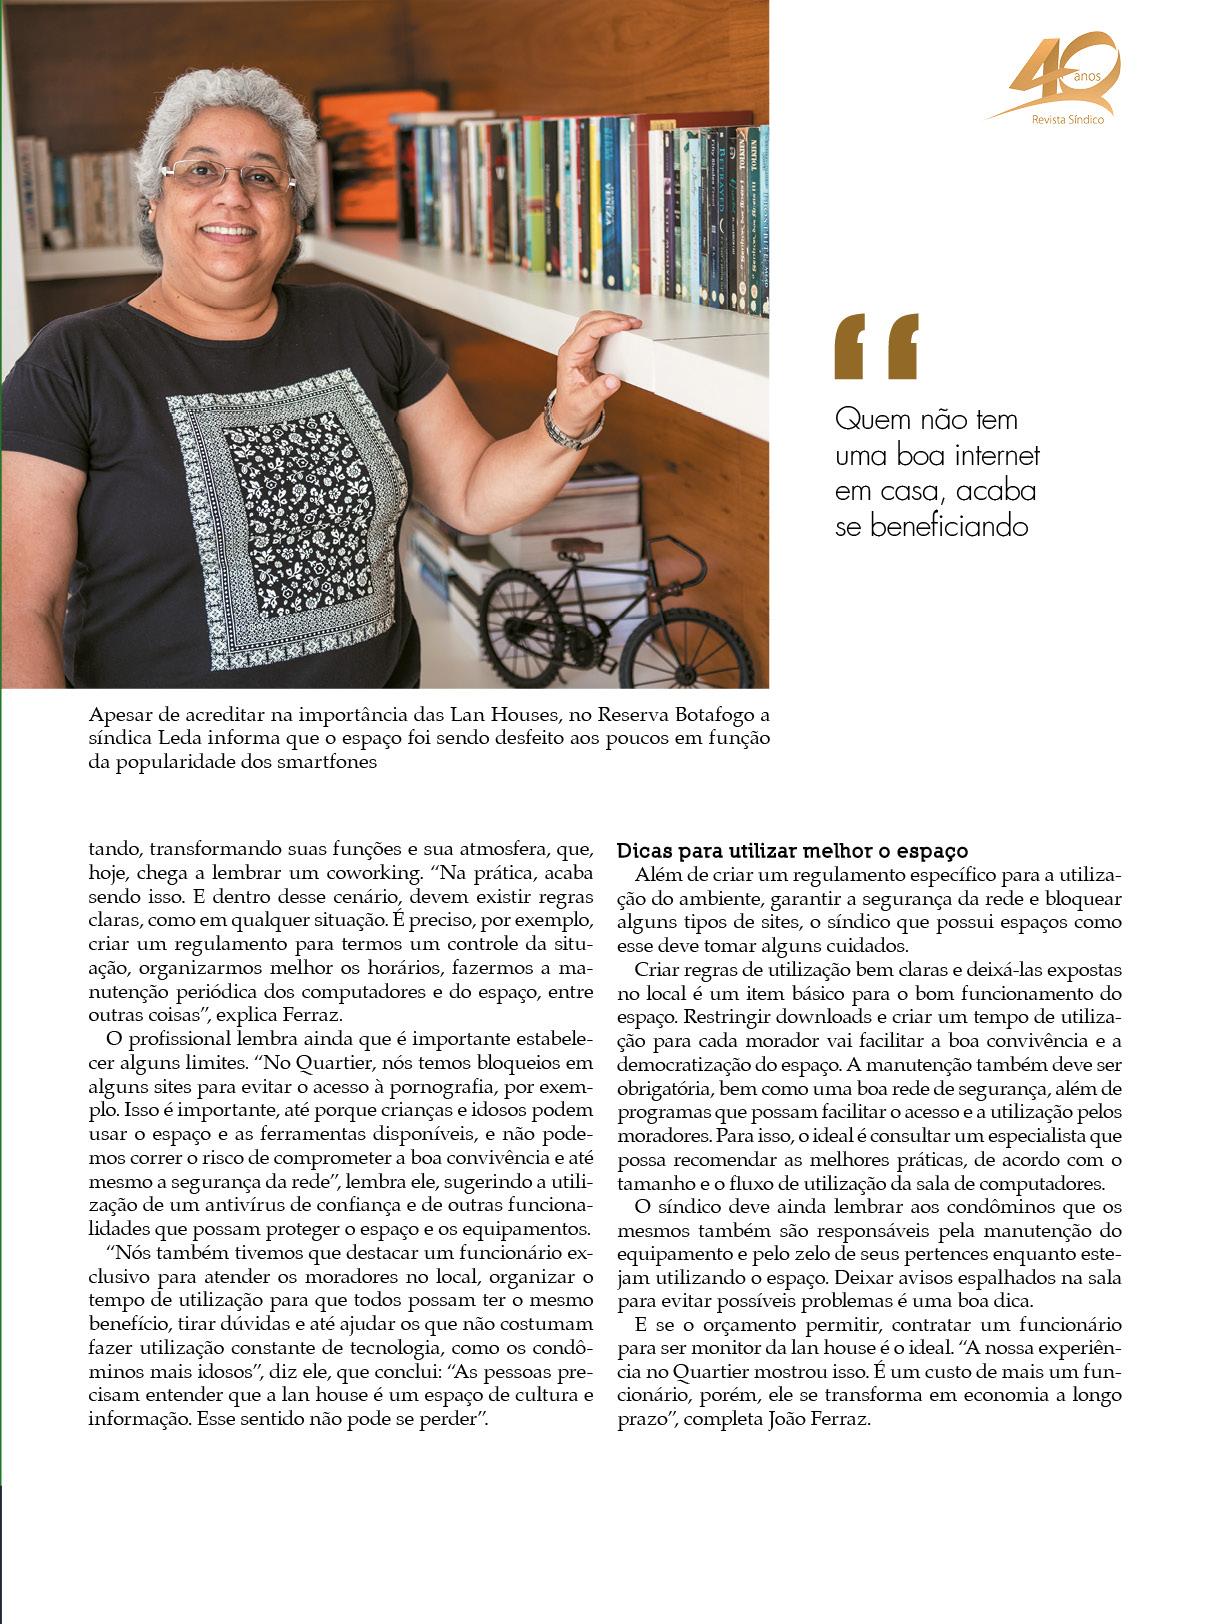 Revista Síndico_ed 24061